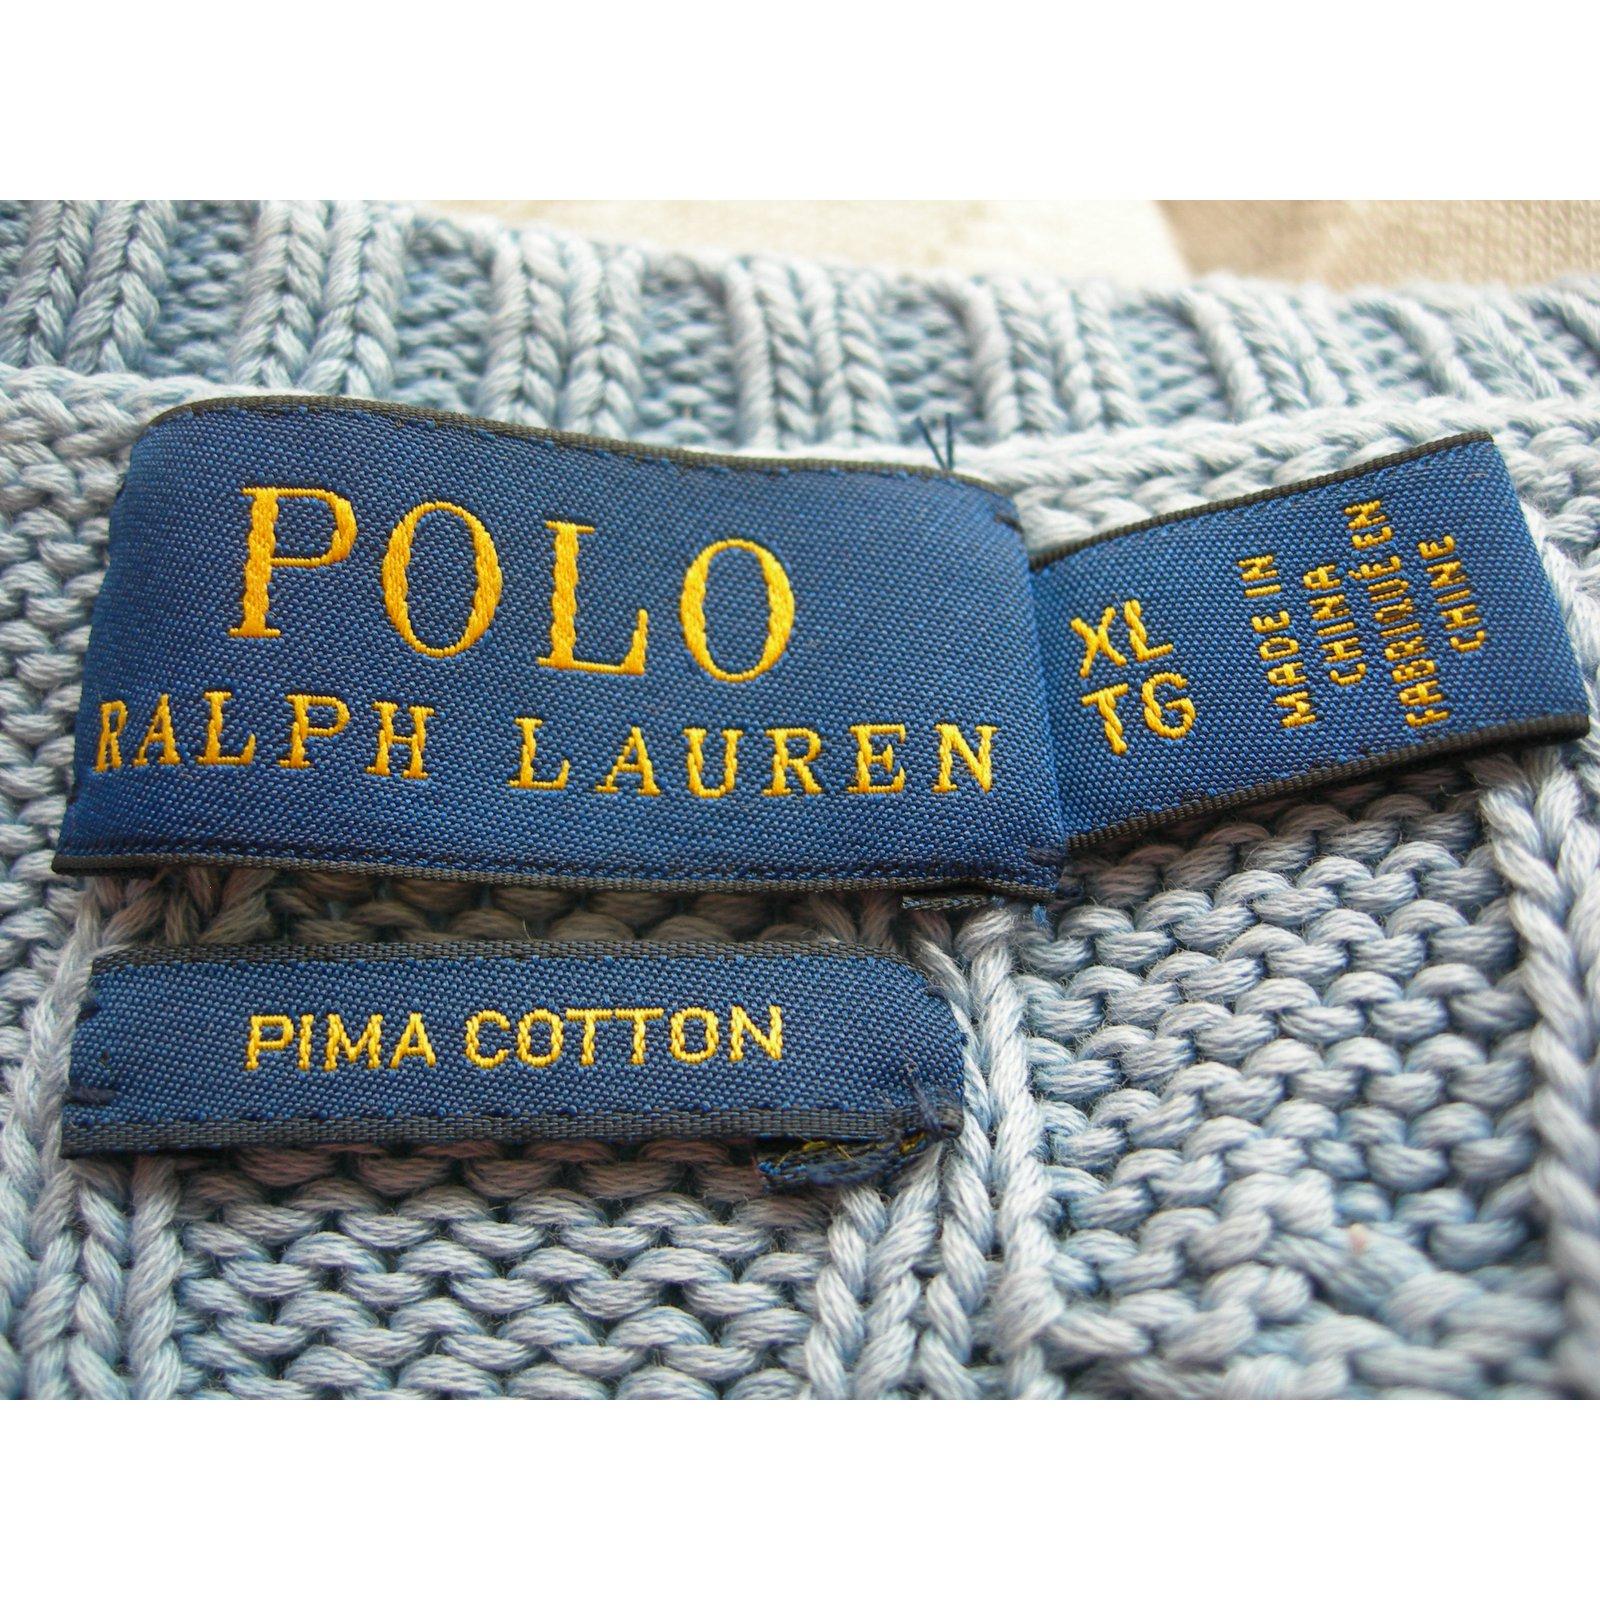 7b43852aea1 Ralph Lauren Knitwear Knitwear Cotton Blue ref.74923 - Joli Closet